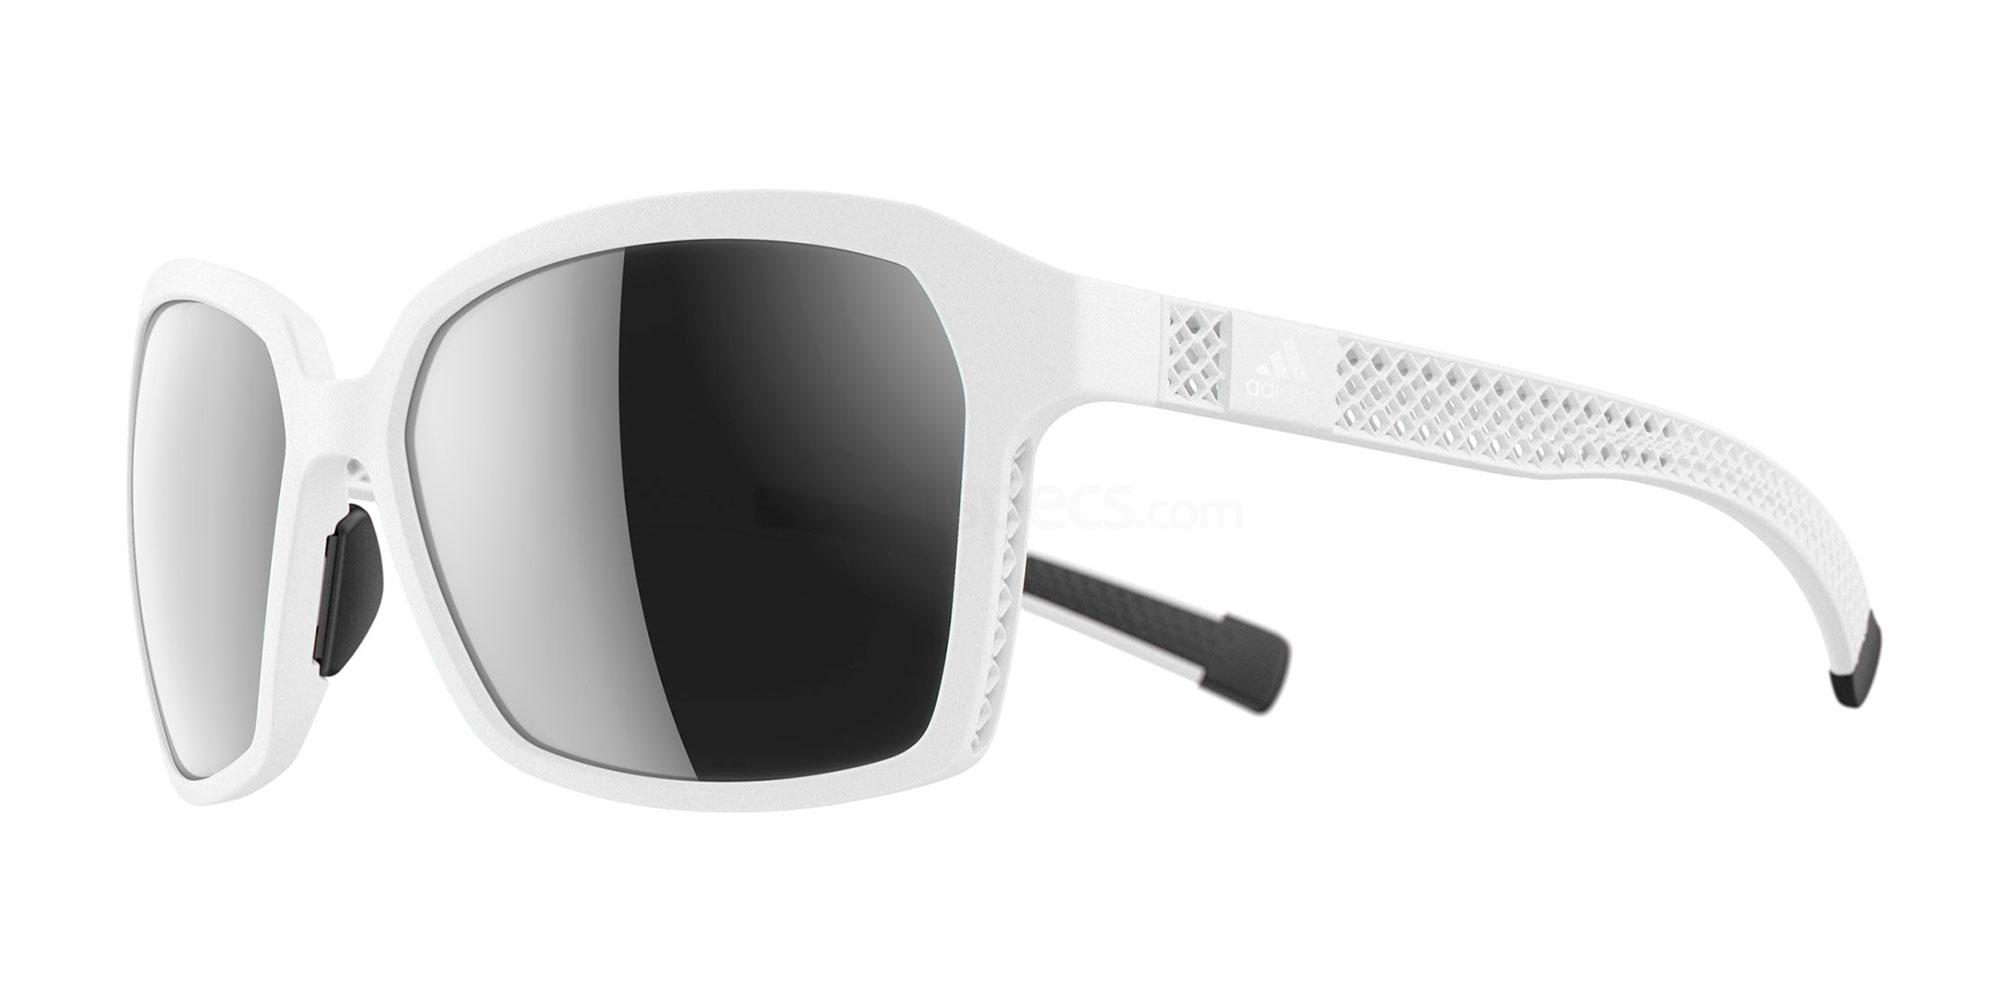 ad43 75 1500 ad43 Aspyr 3D_F Sunglasses, Adidas